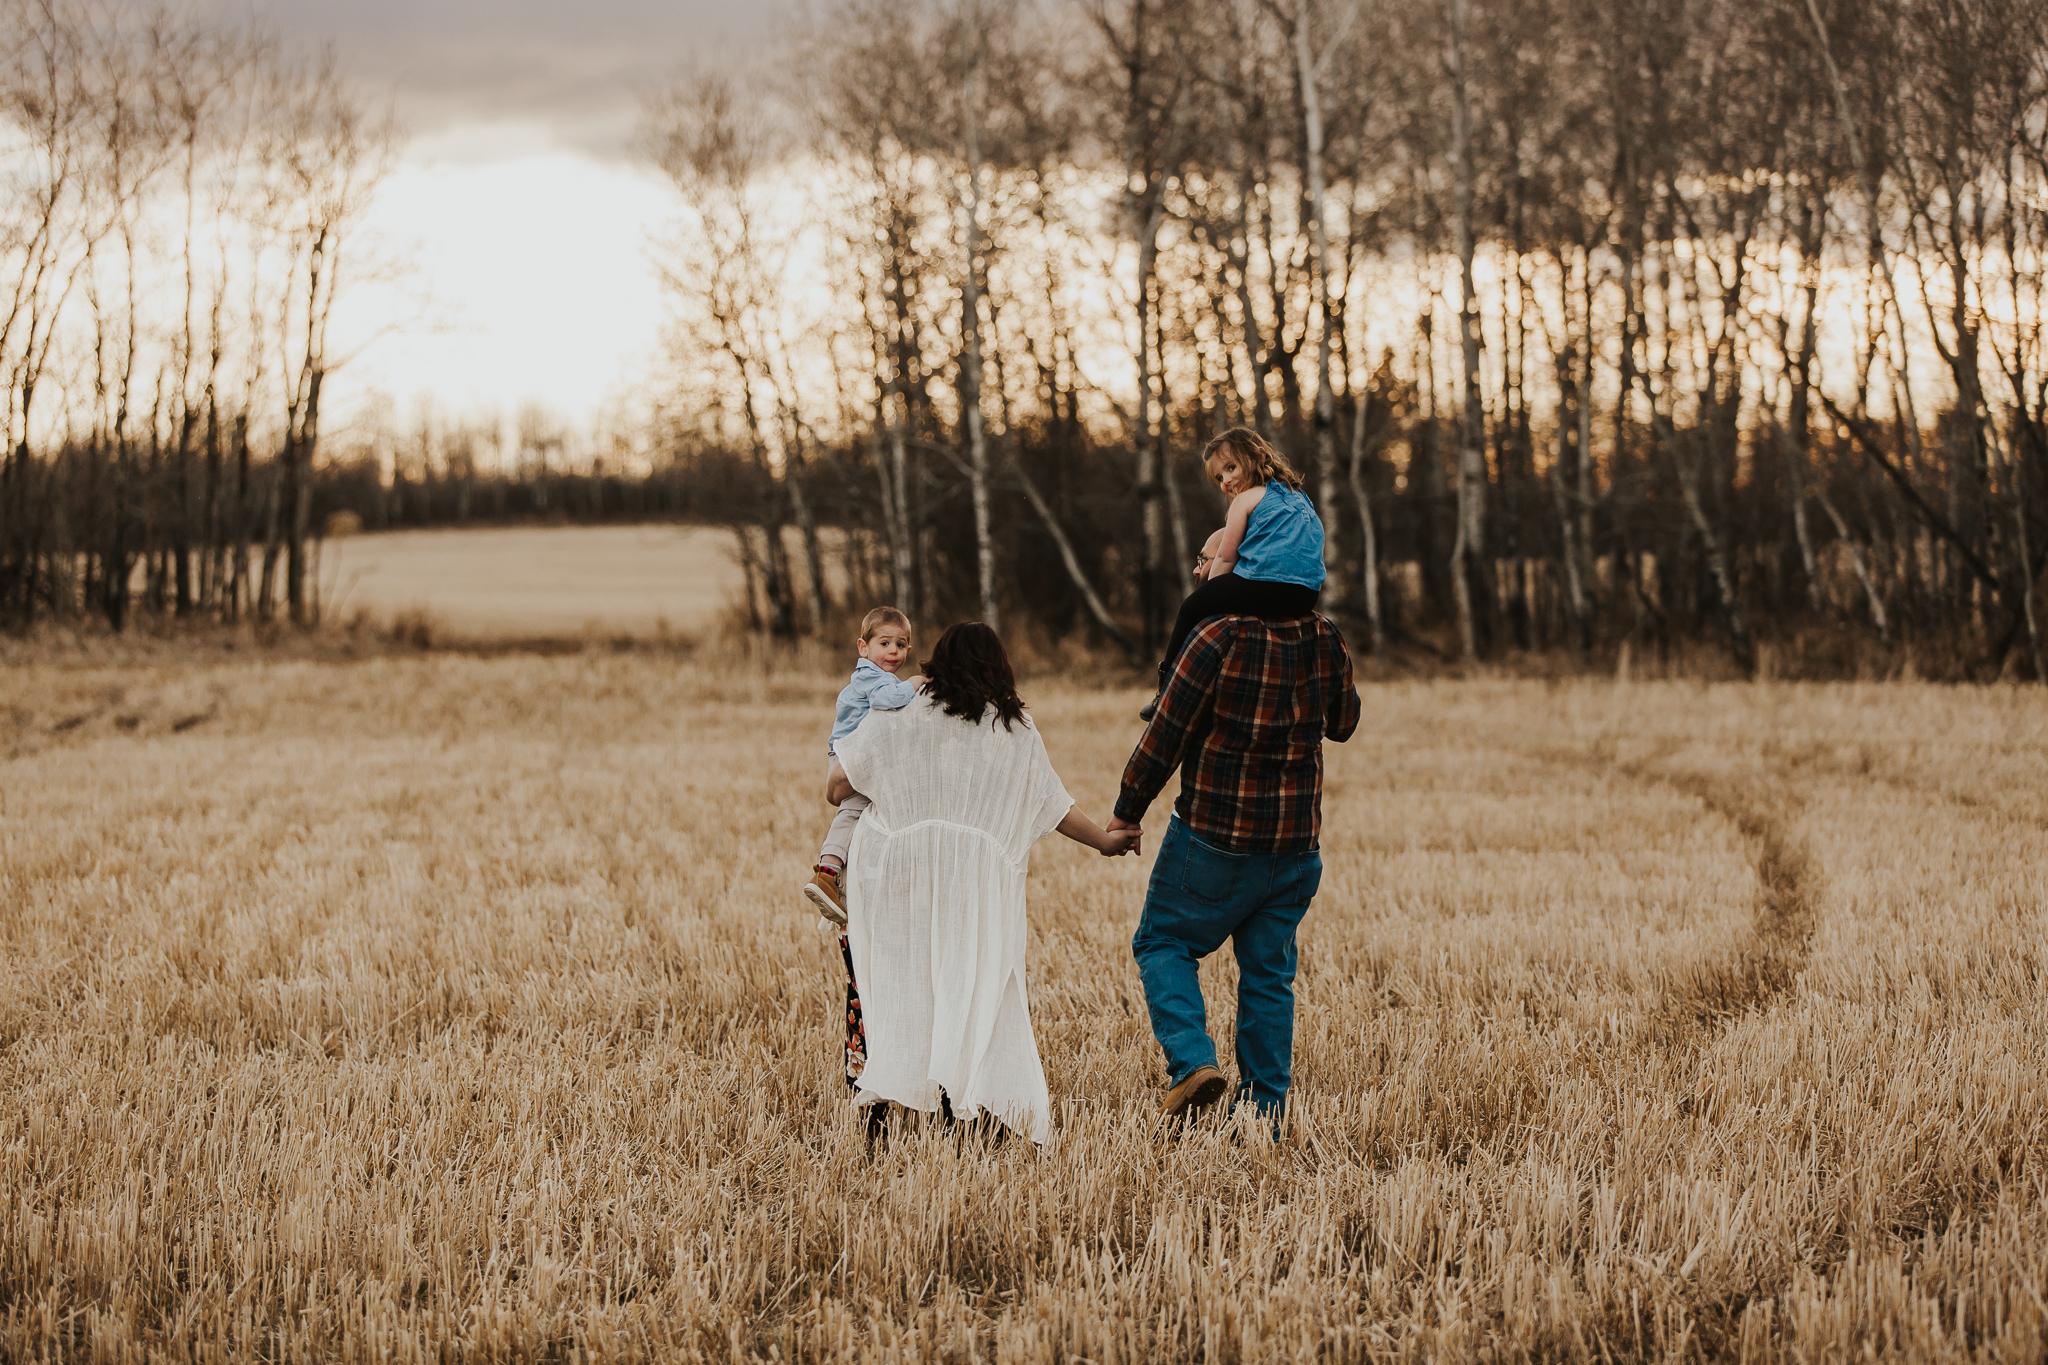 Alina-Joy-Photography-Cold-Lake-Maternity-Photographer-Josee-15.jpg